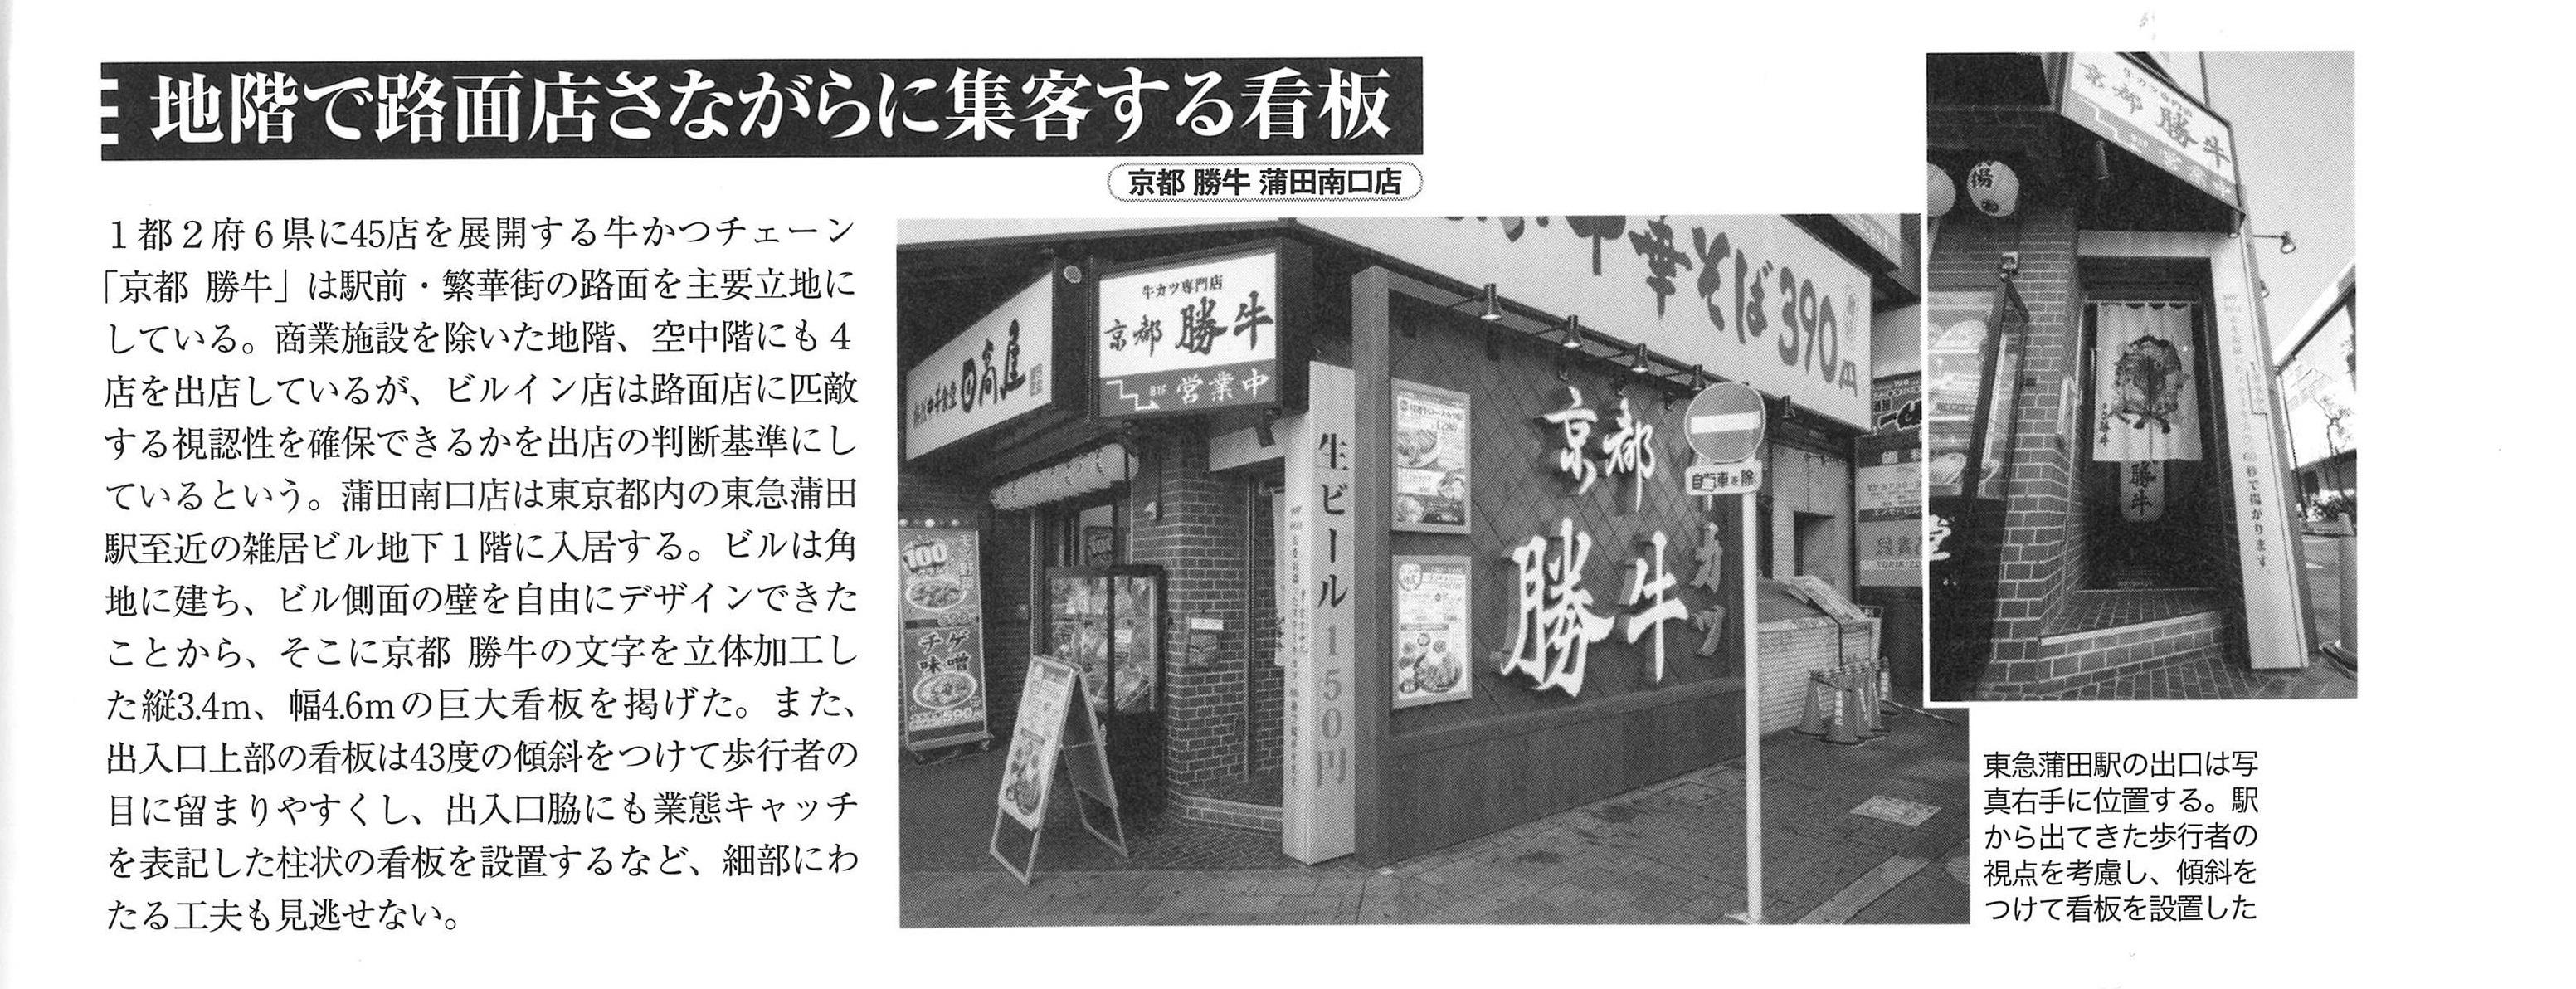 171027月間食堂(KG蒲田)